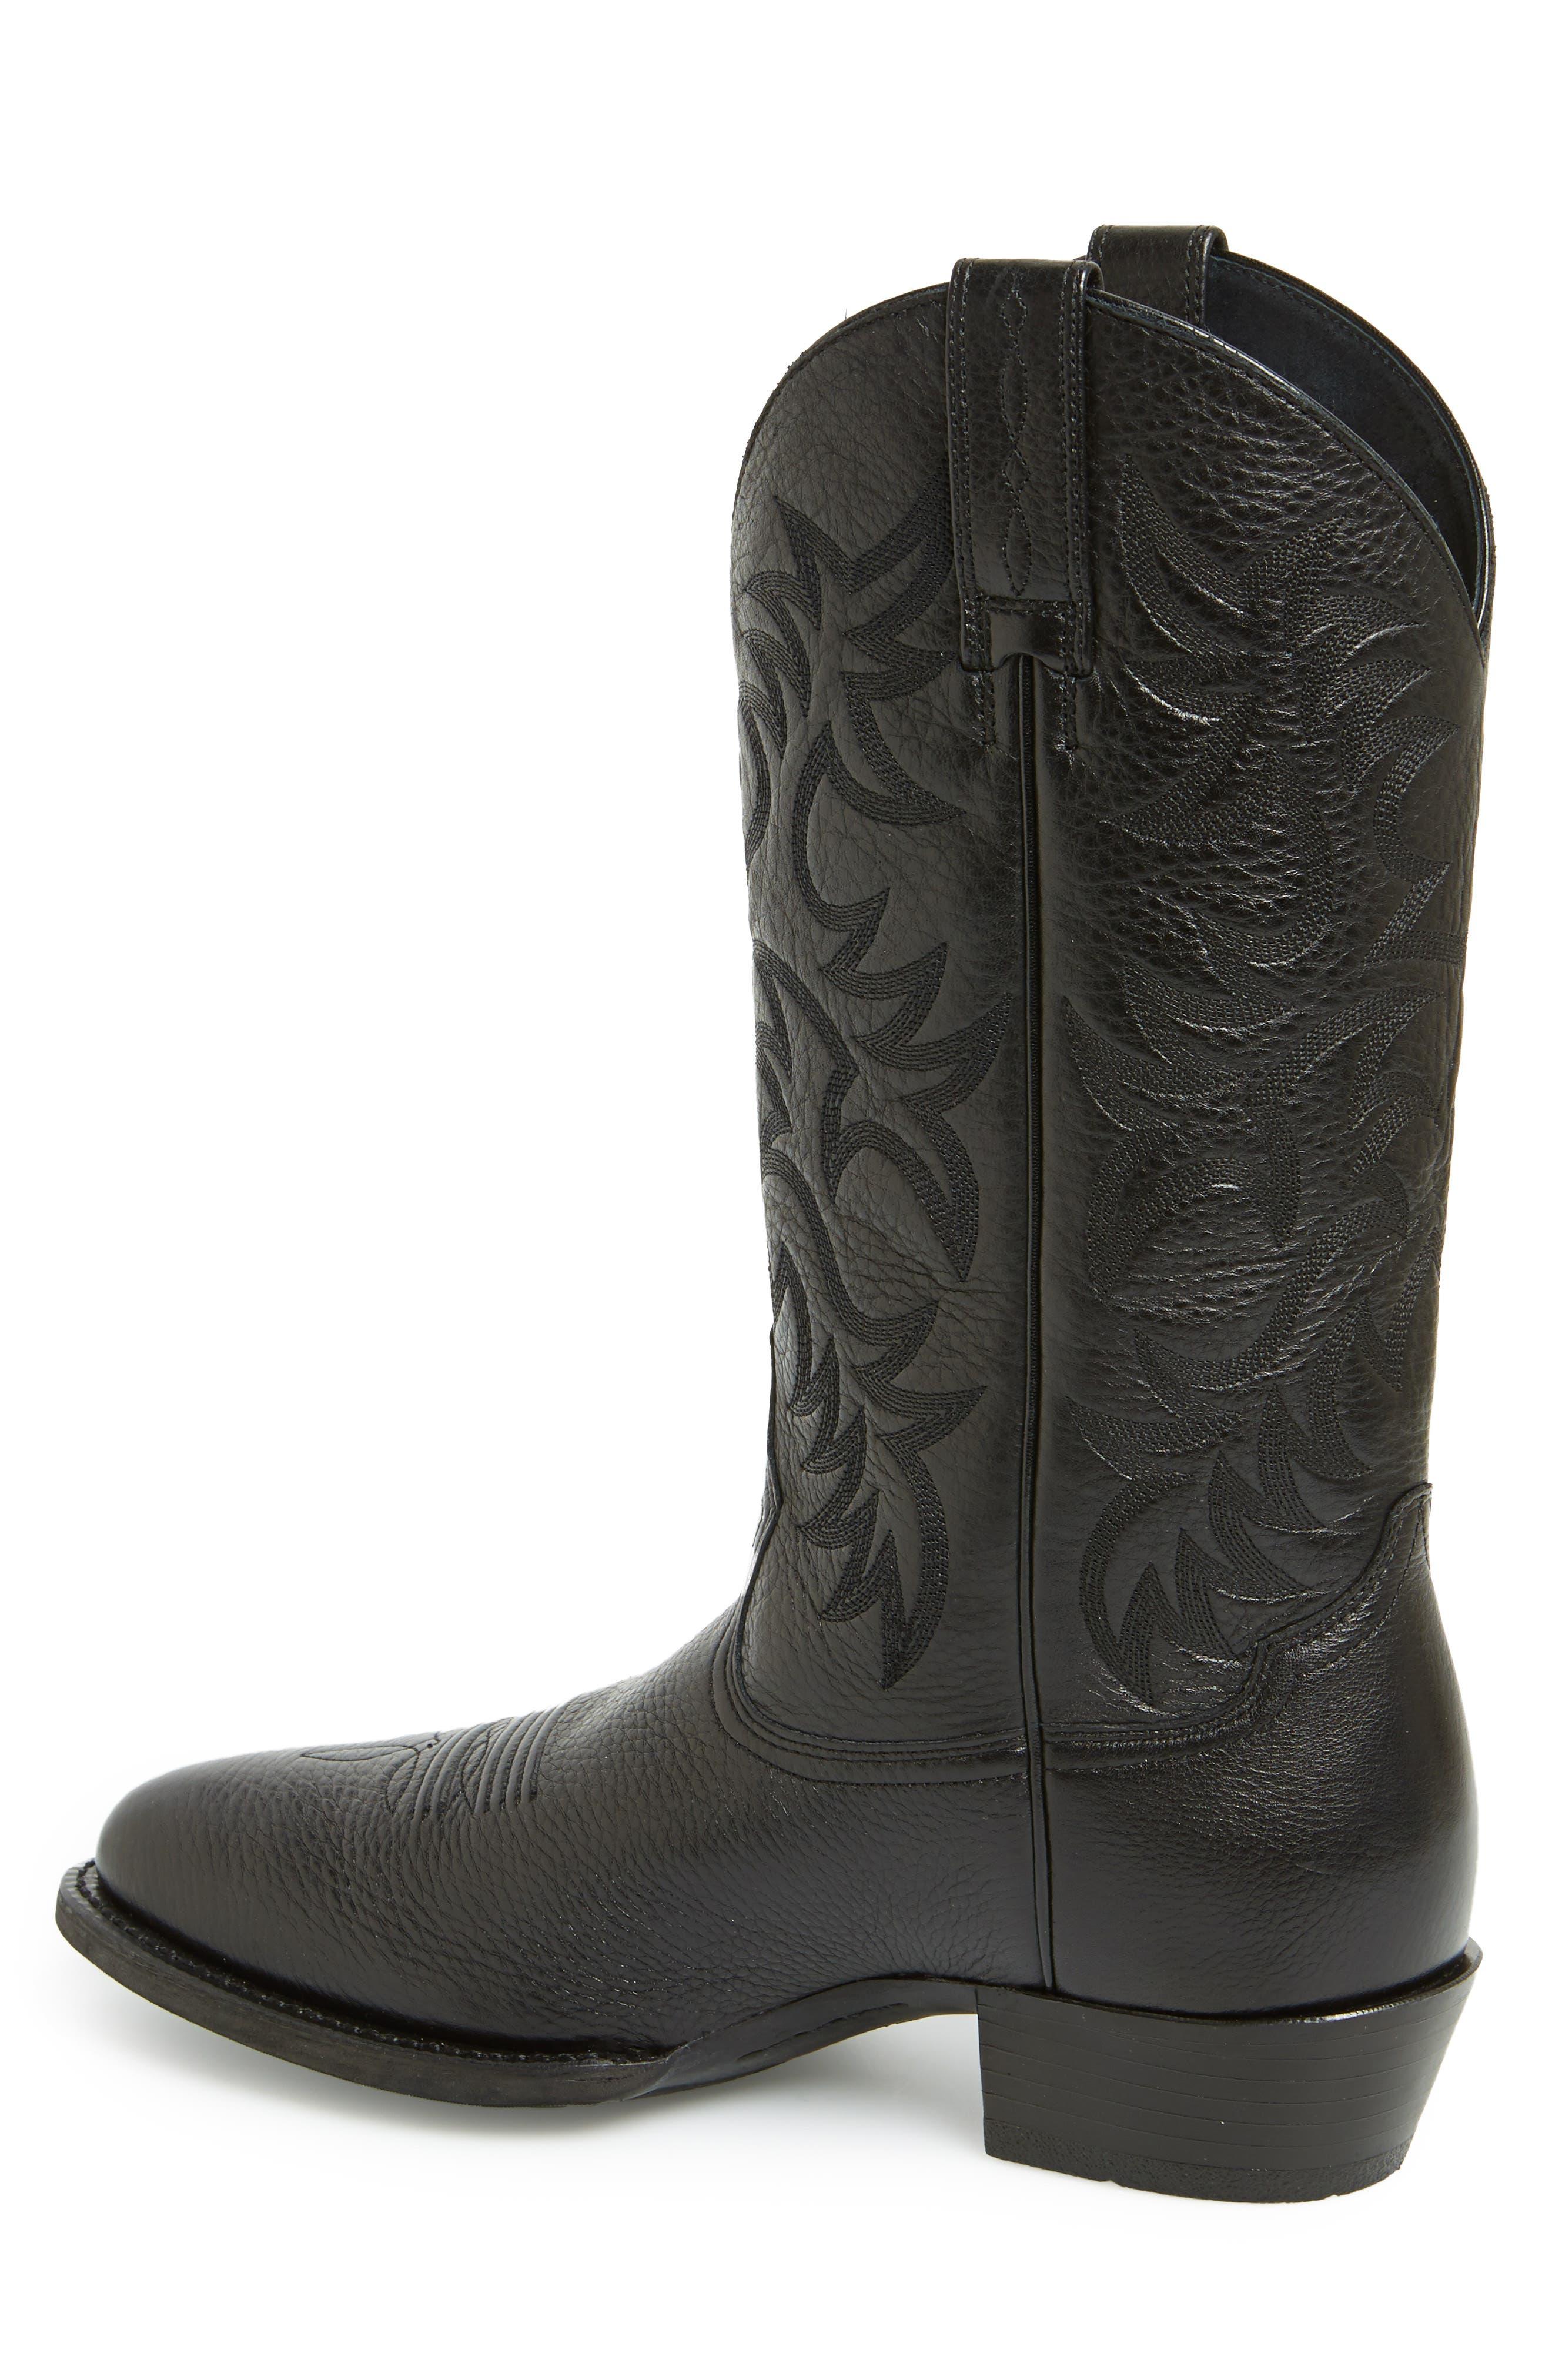 'Heritage' Leather Cowboy R-Toe Boot,                             Alternate thumbnail 6, color,                             BLACK DEERTAN